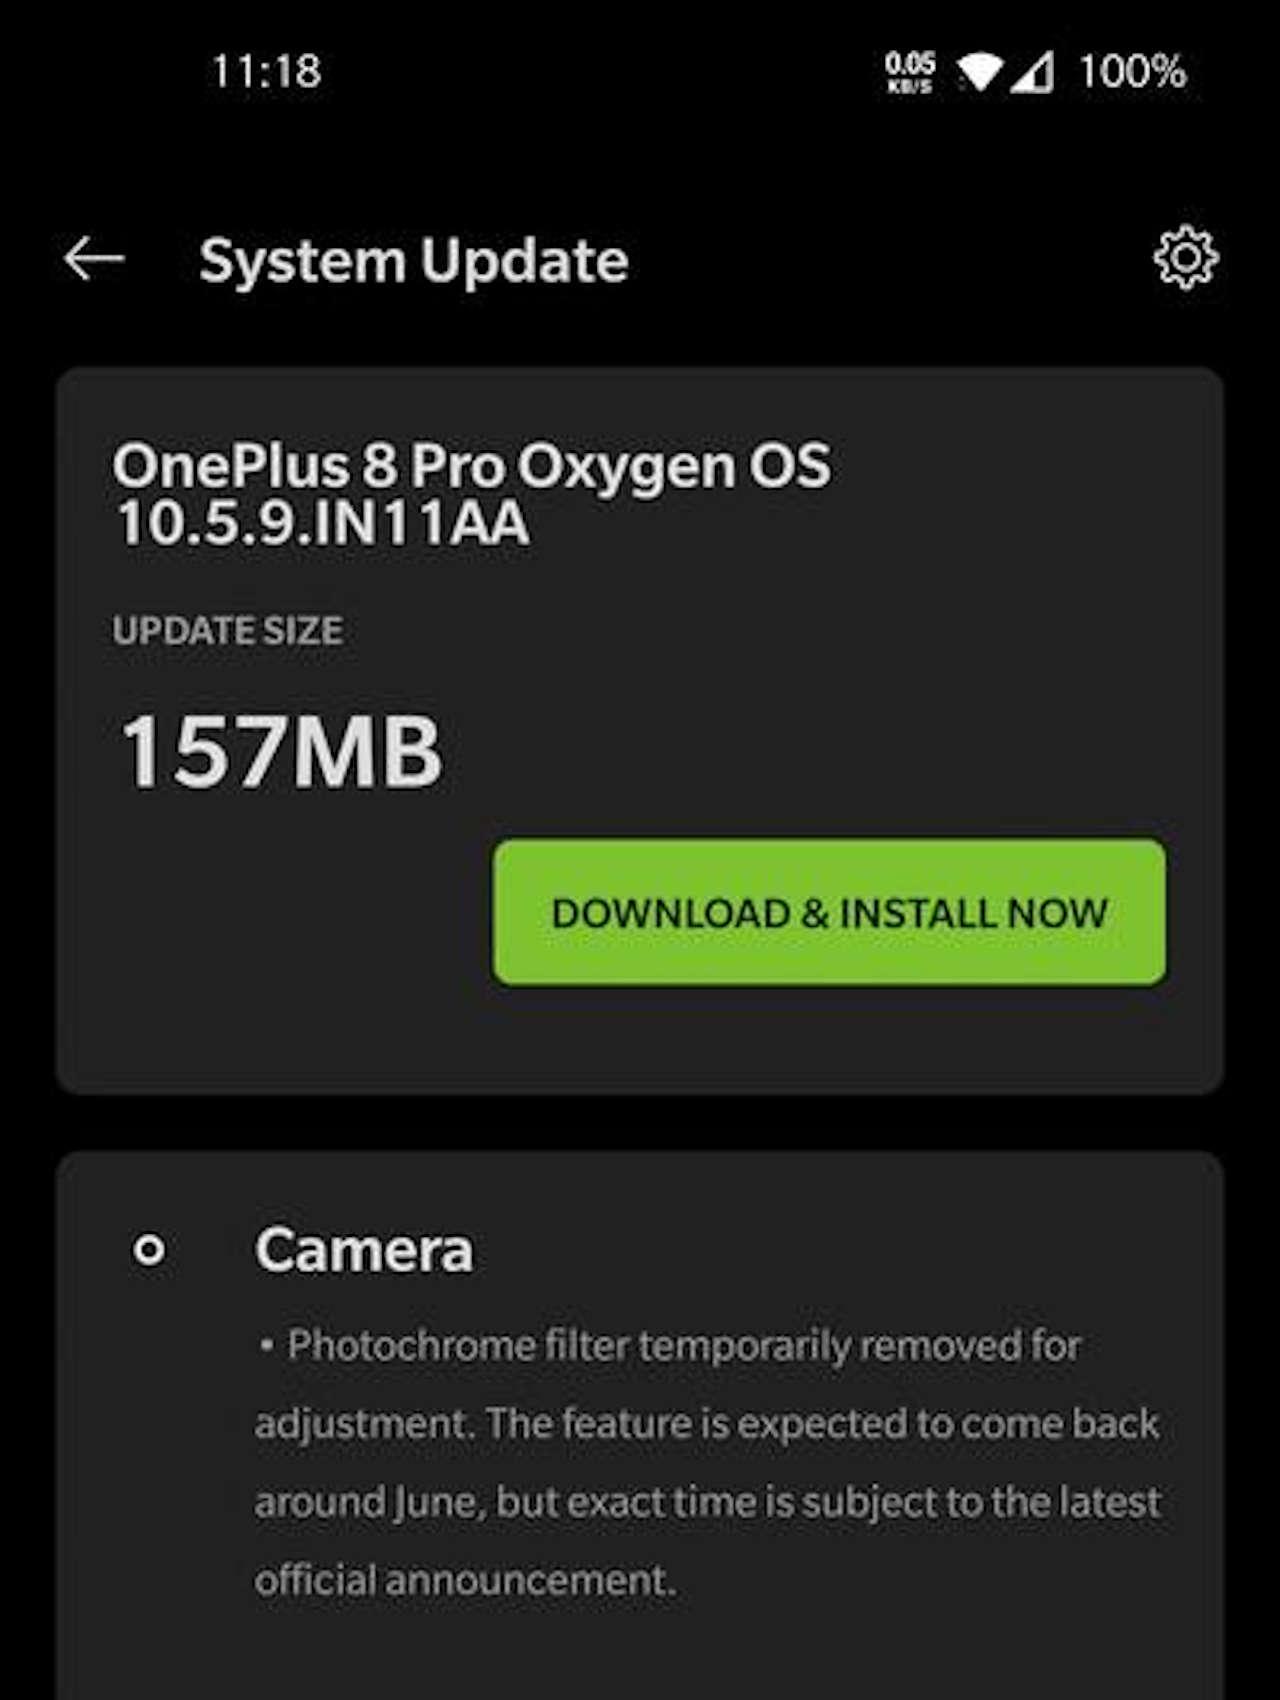 oneplus 8 pro oxigenos 10.5.9